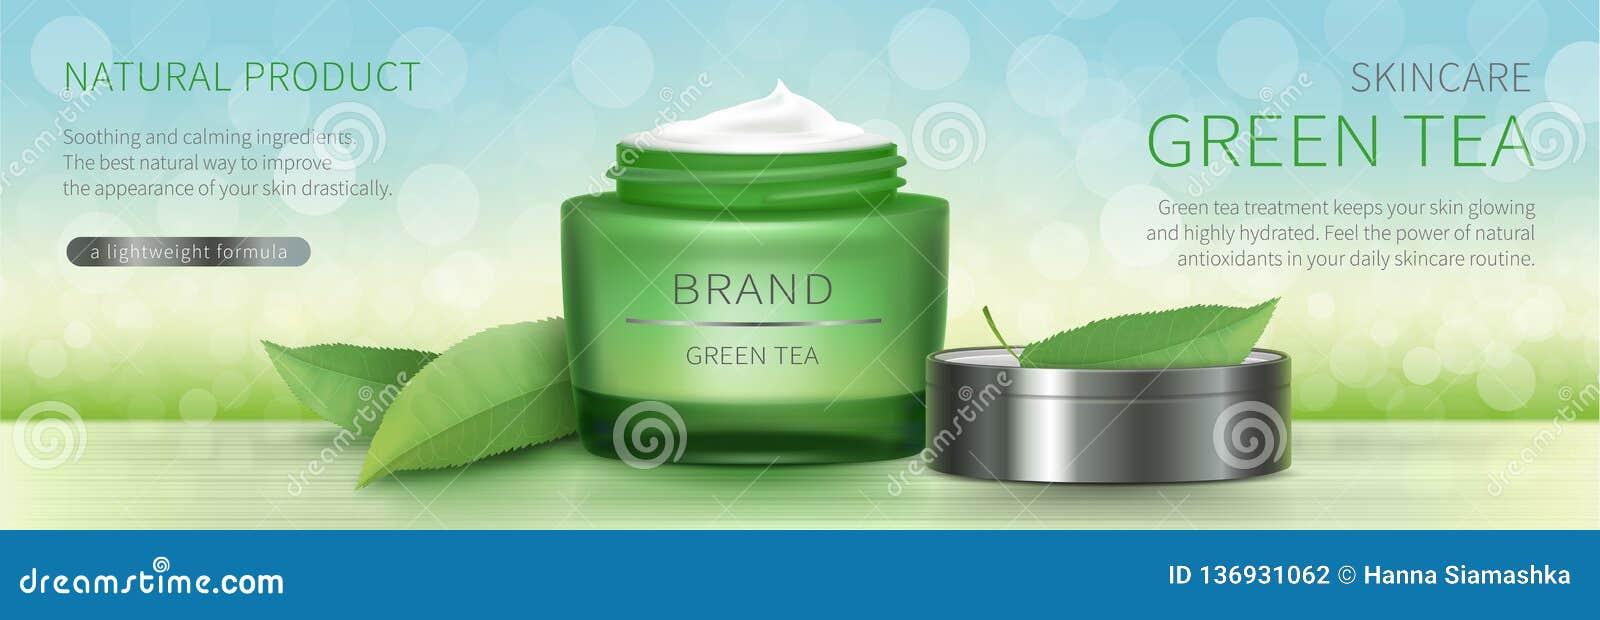 Tarro de cristal verde con crema natural